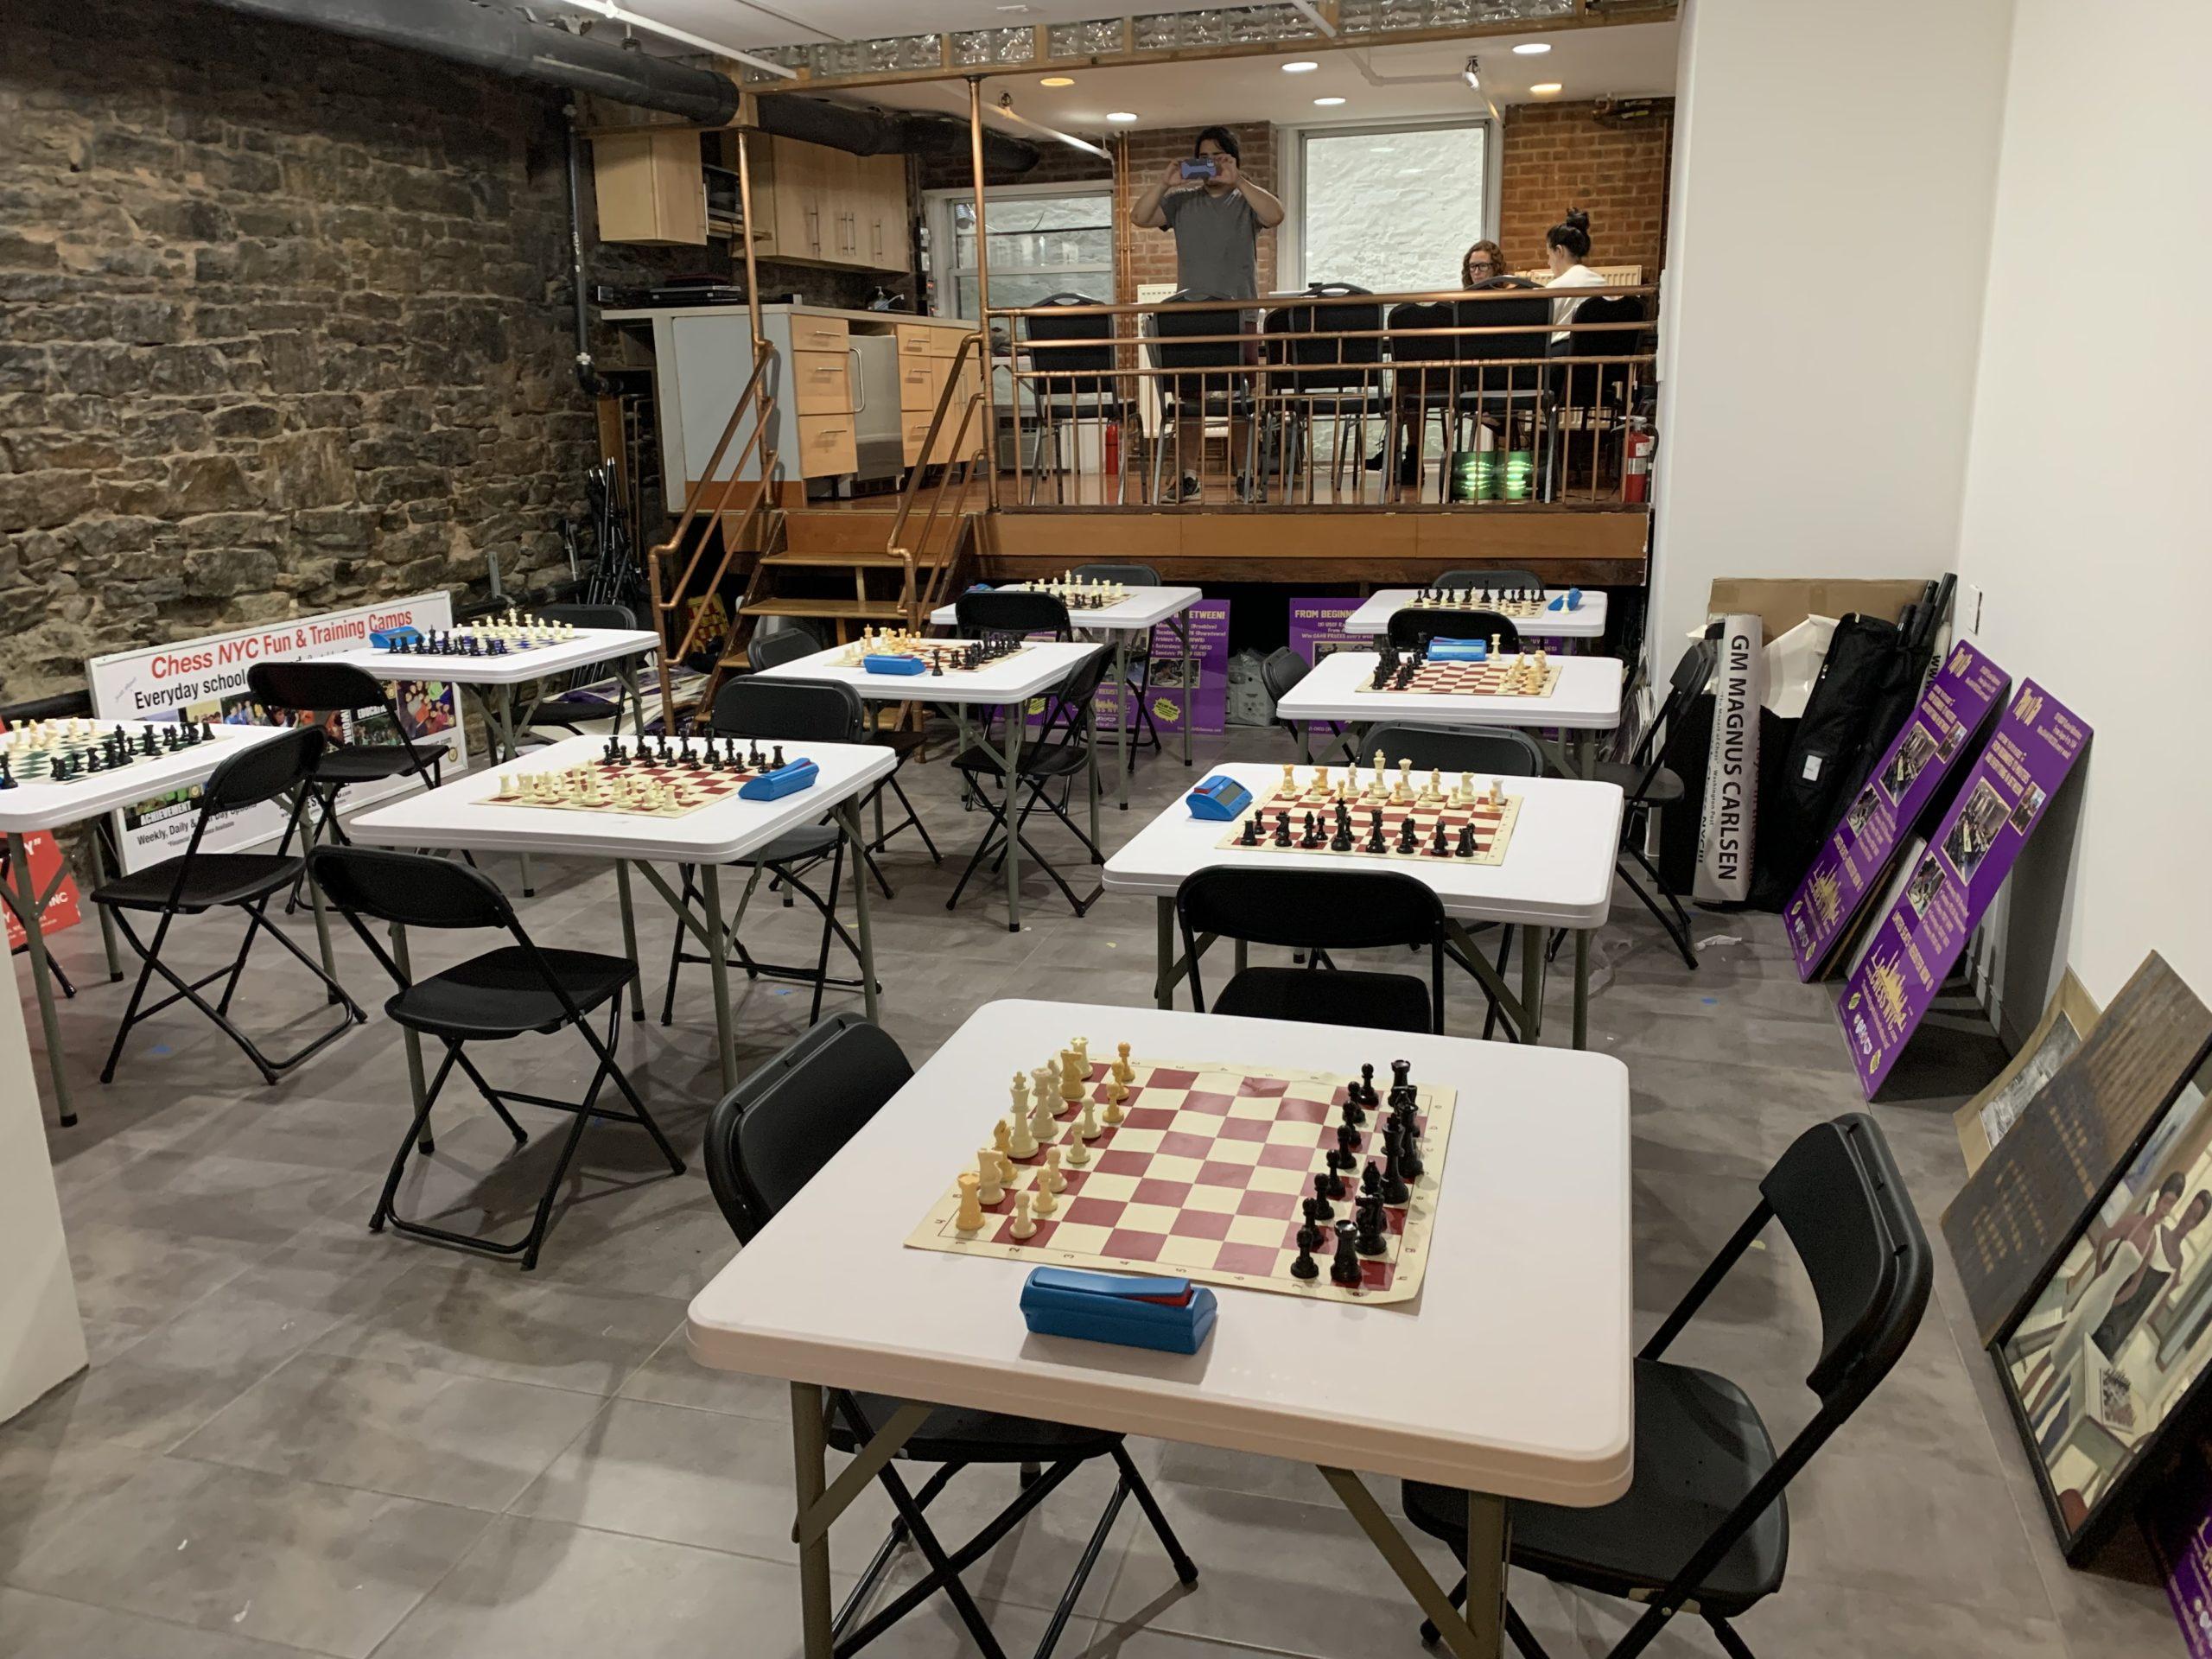 Village Chess at SoHo